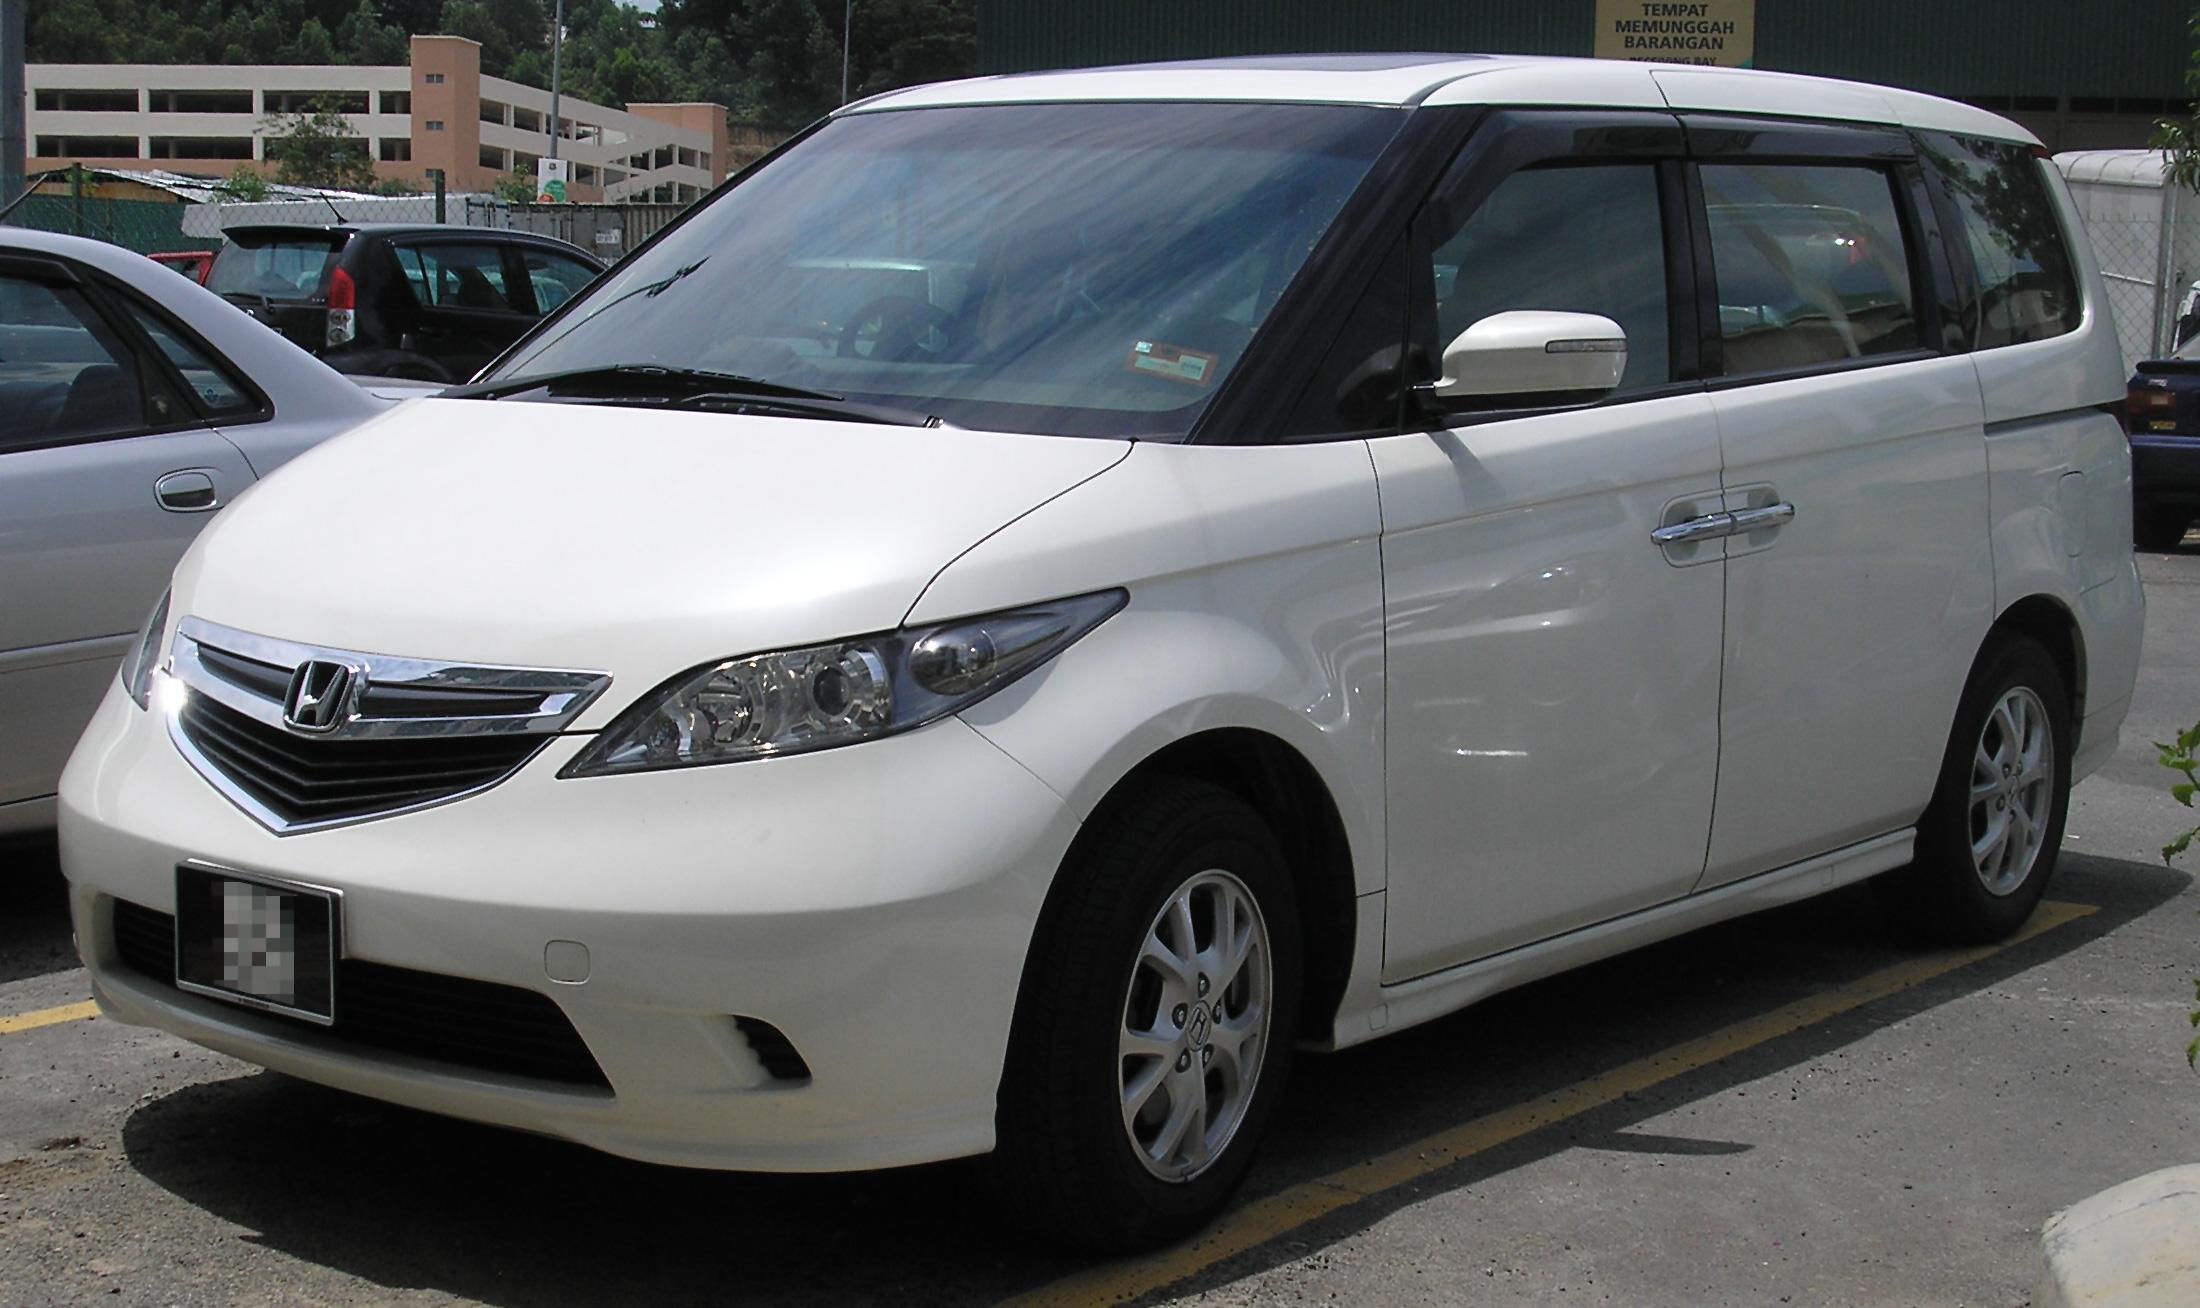 File:Honda Elysion (first generation) (front), Serdang.jpg